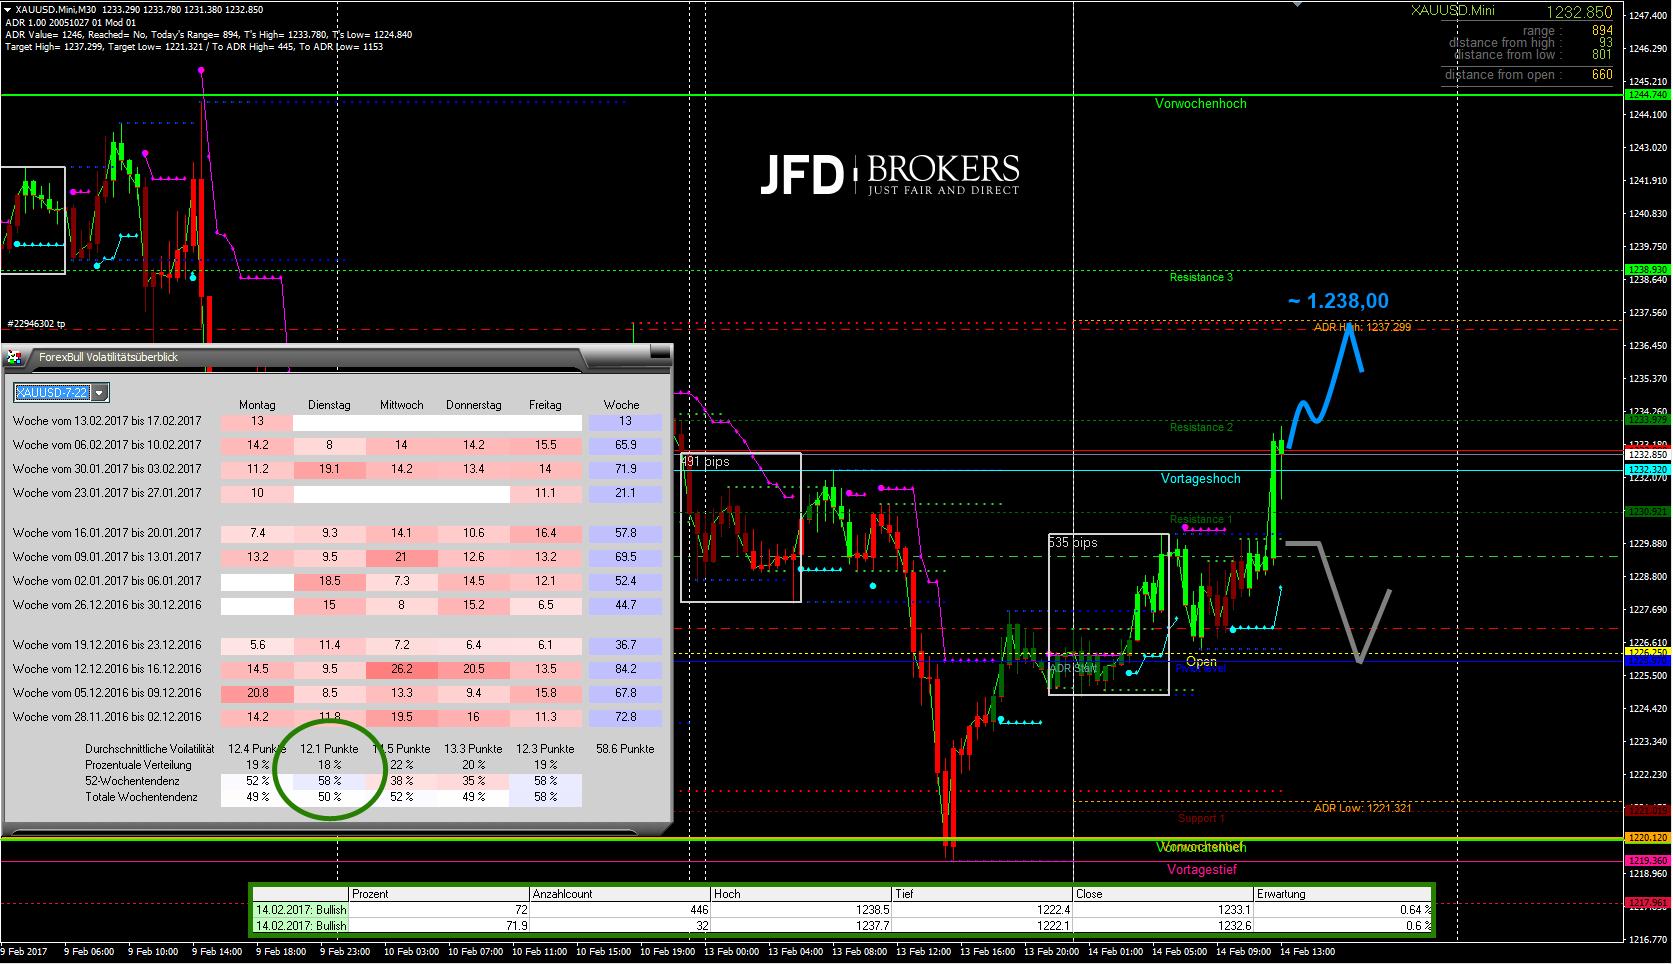 Gold-M30-Kommt-heute-noch-die-1-238-50-USD-Kommentar-Christian-Kämmerer-JFD-Brokers-GodmodeTrader.de-1